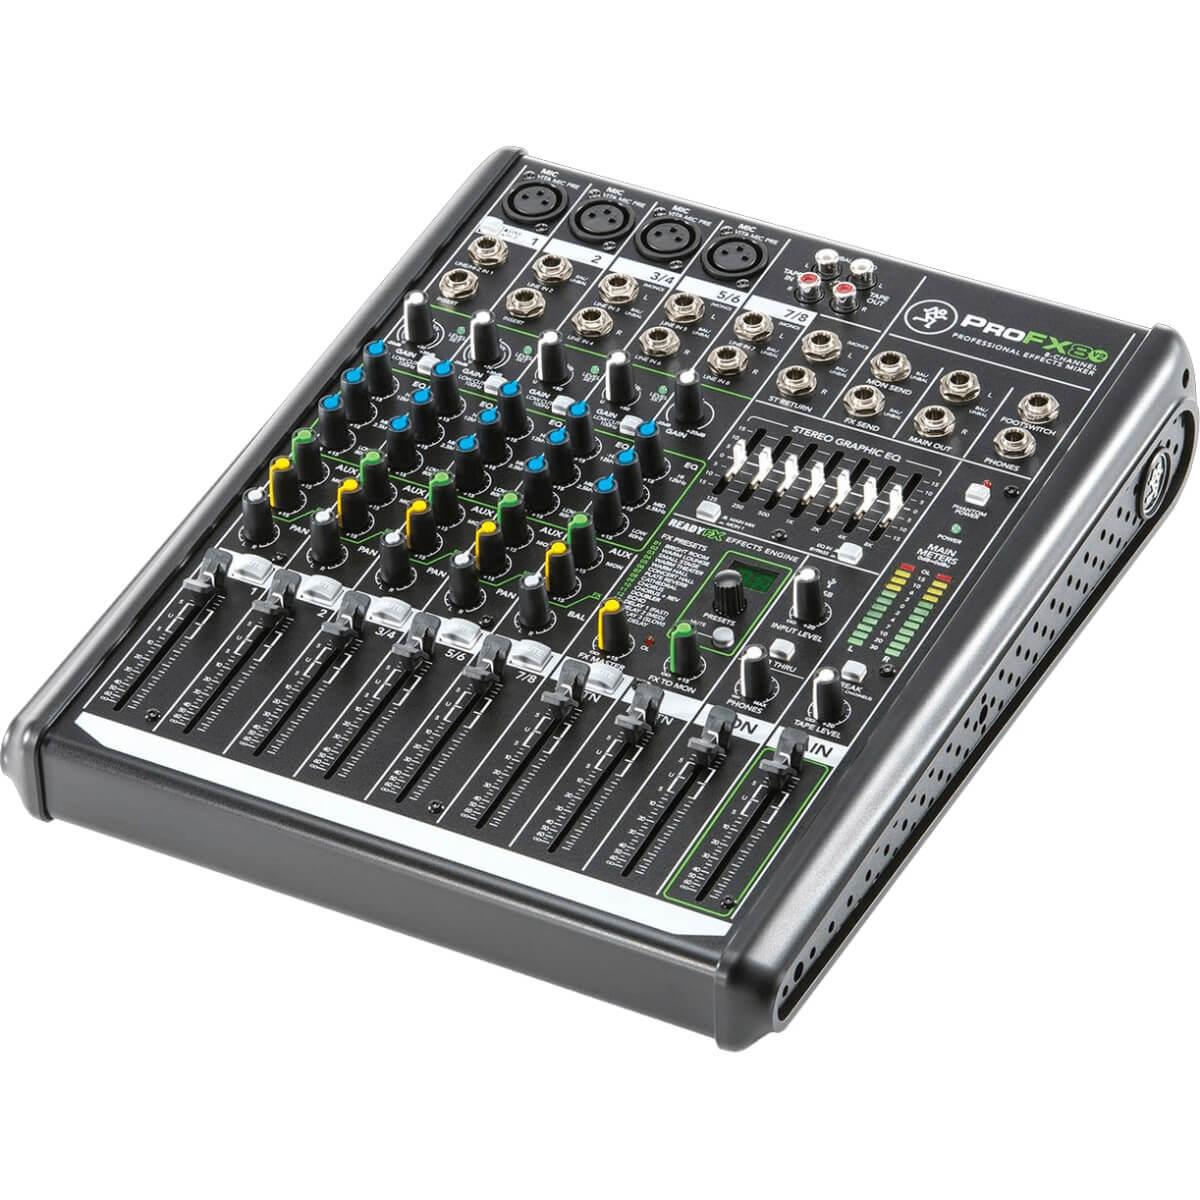 Image of   Mackie ProFX8v2 mixer